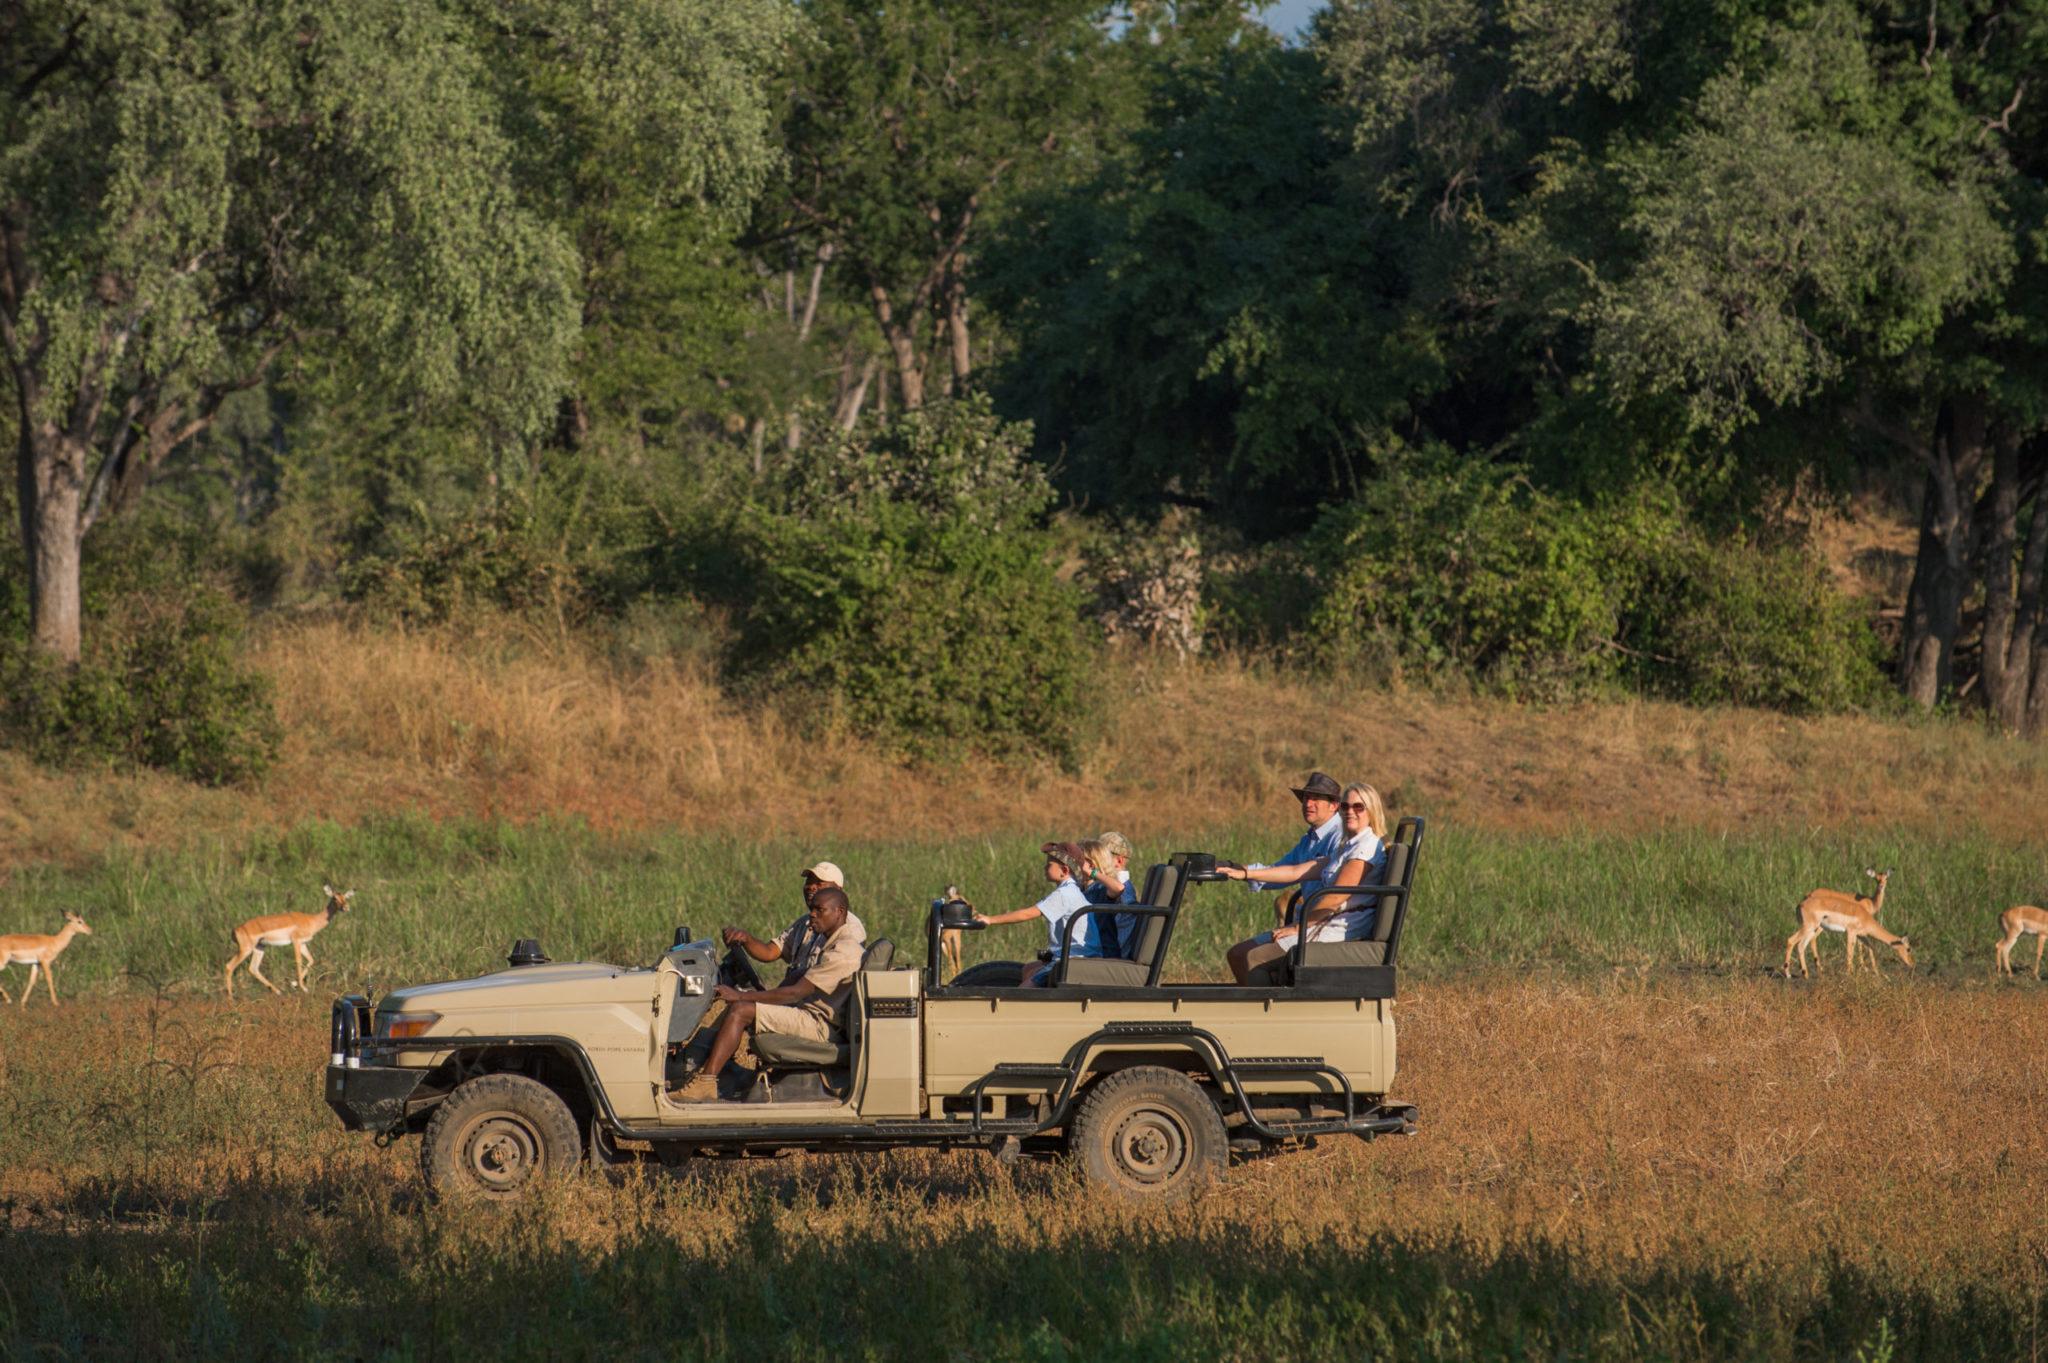 Tena Tena Camp in Zambia: Glamping safaris in South Luangwa NP